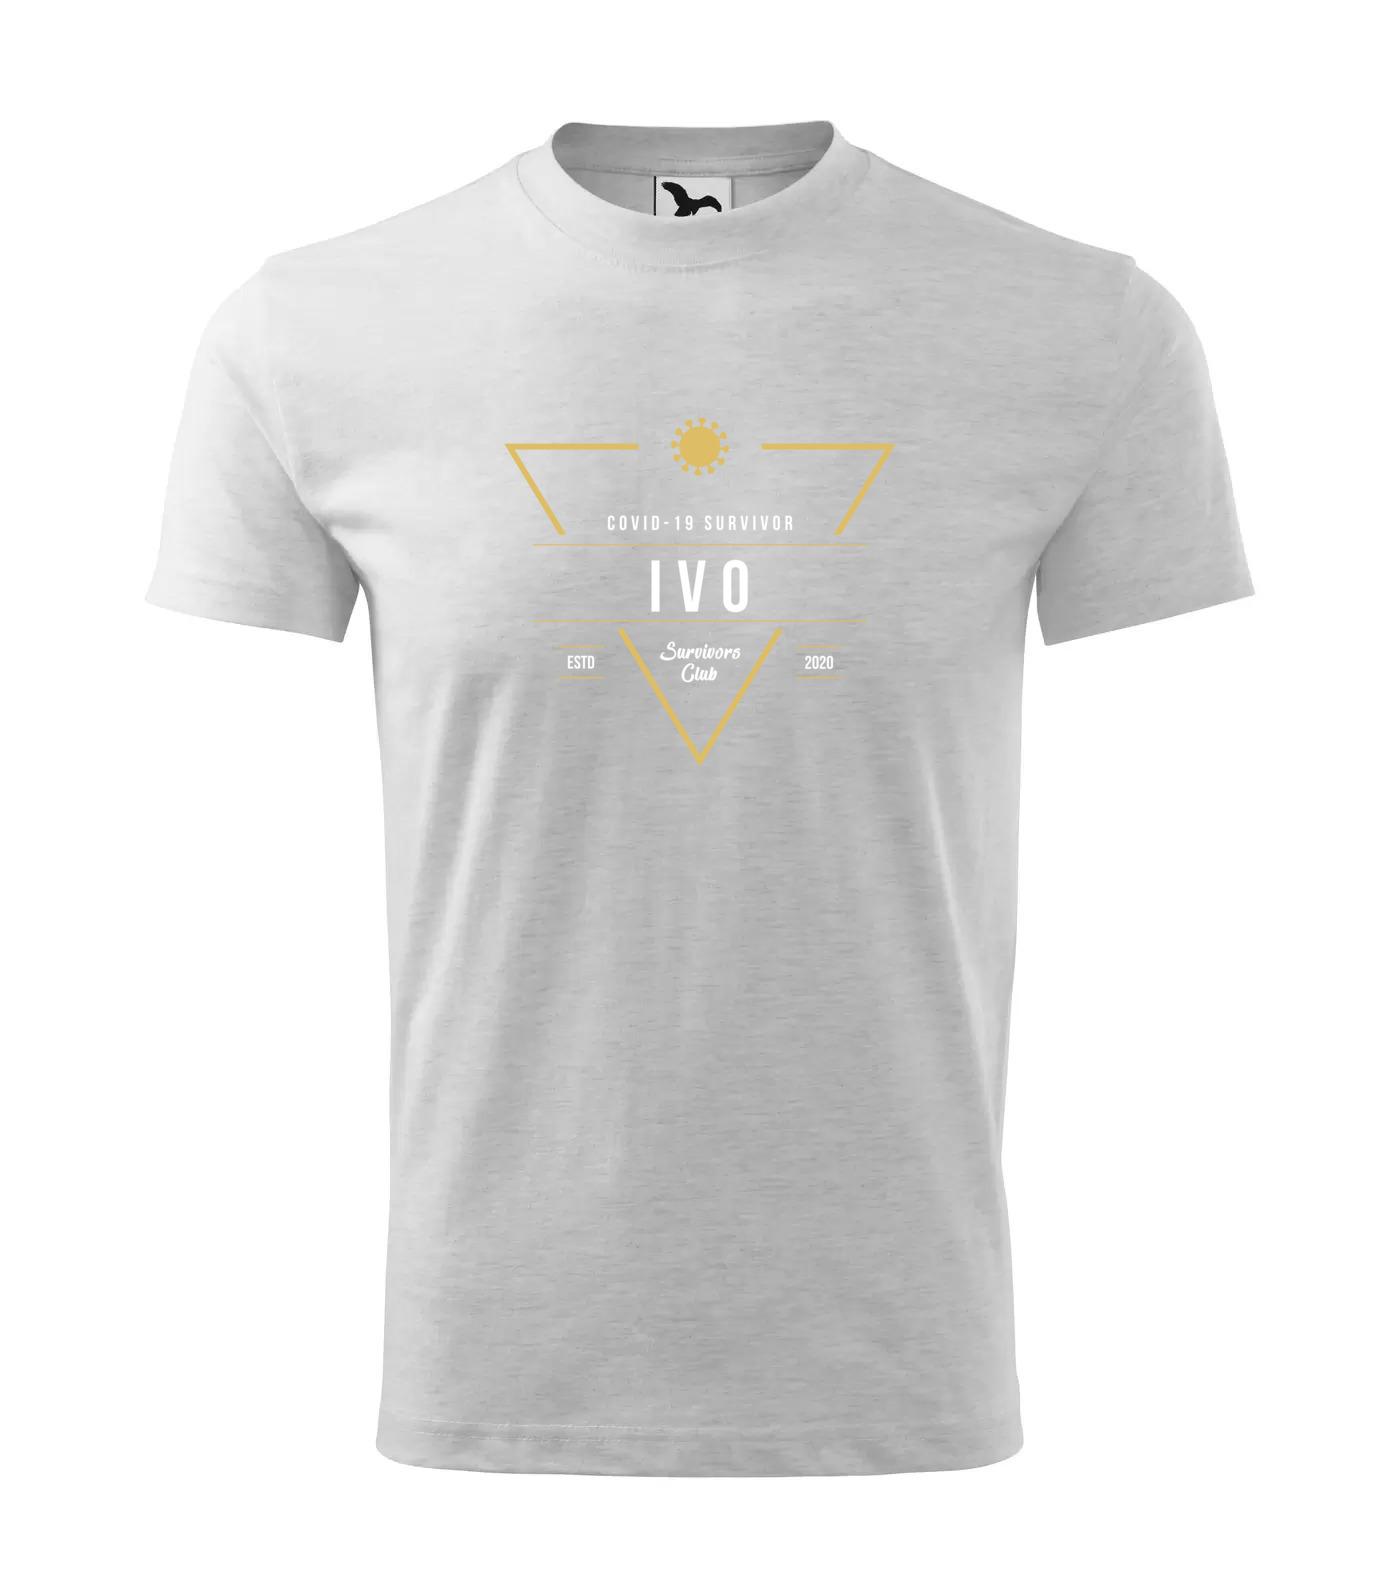 Tričko Survivor Club Ivo